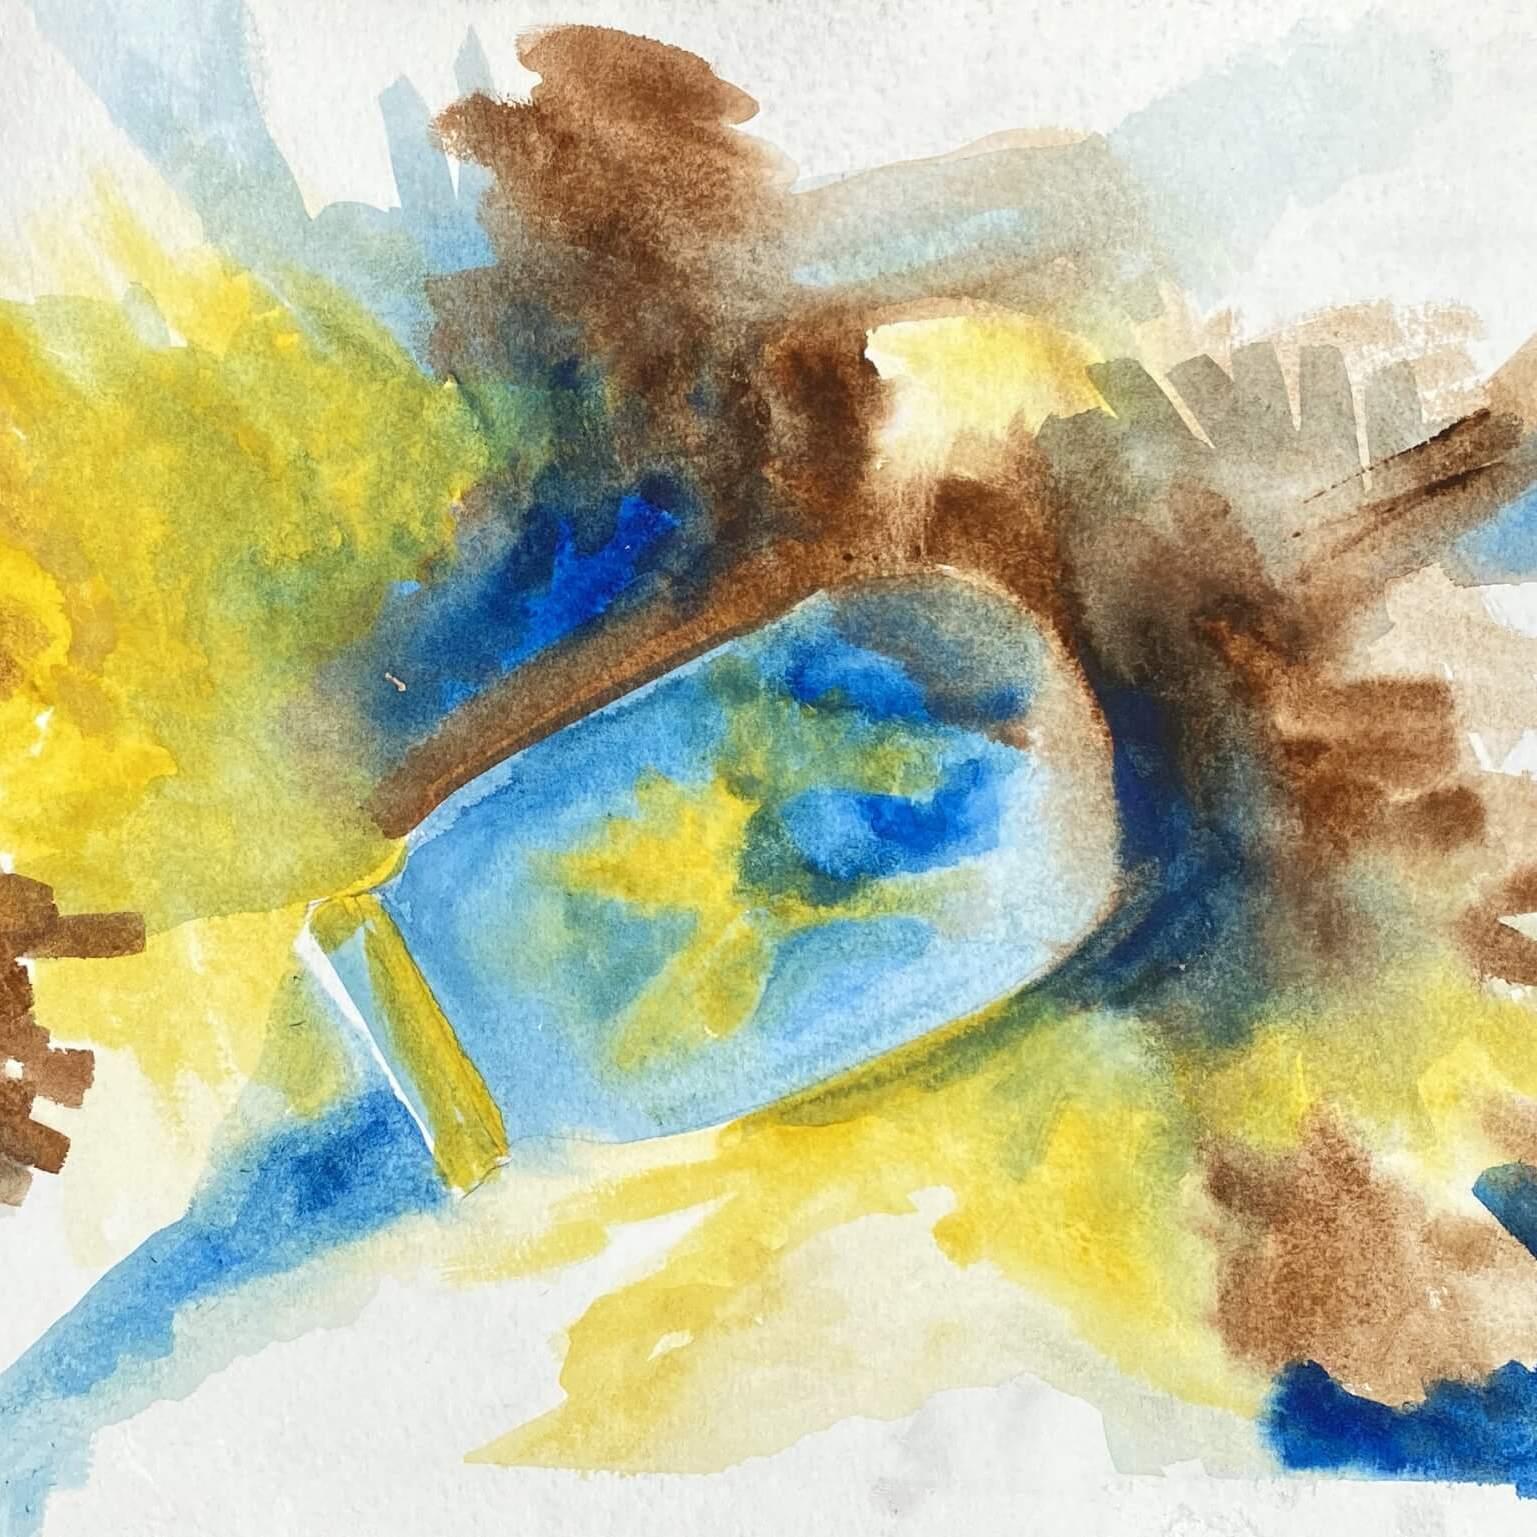 Jar of Stars - Watercolor illustration